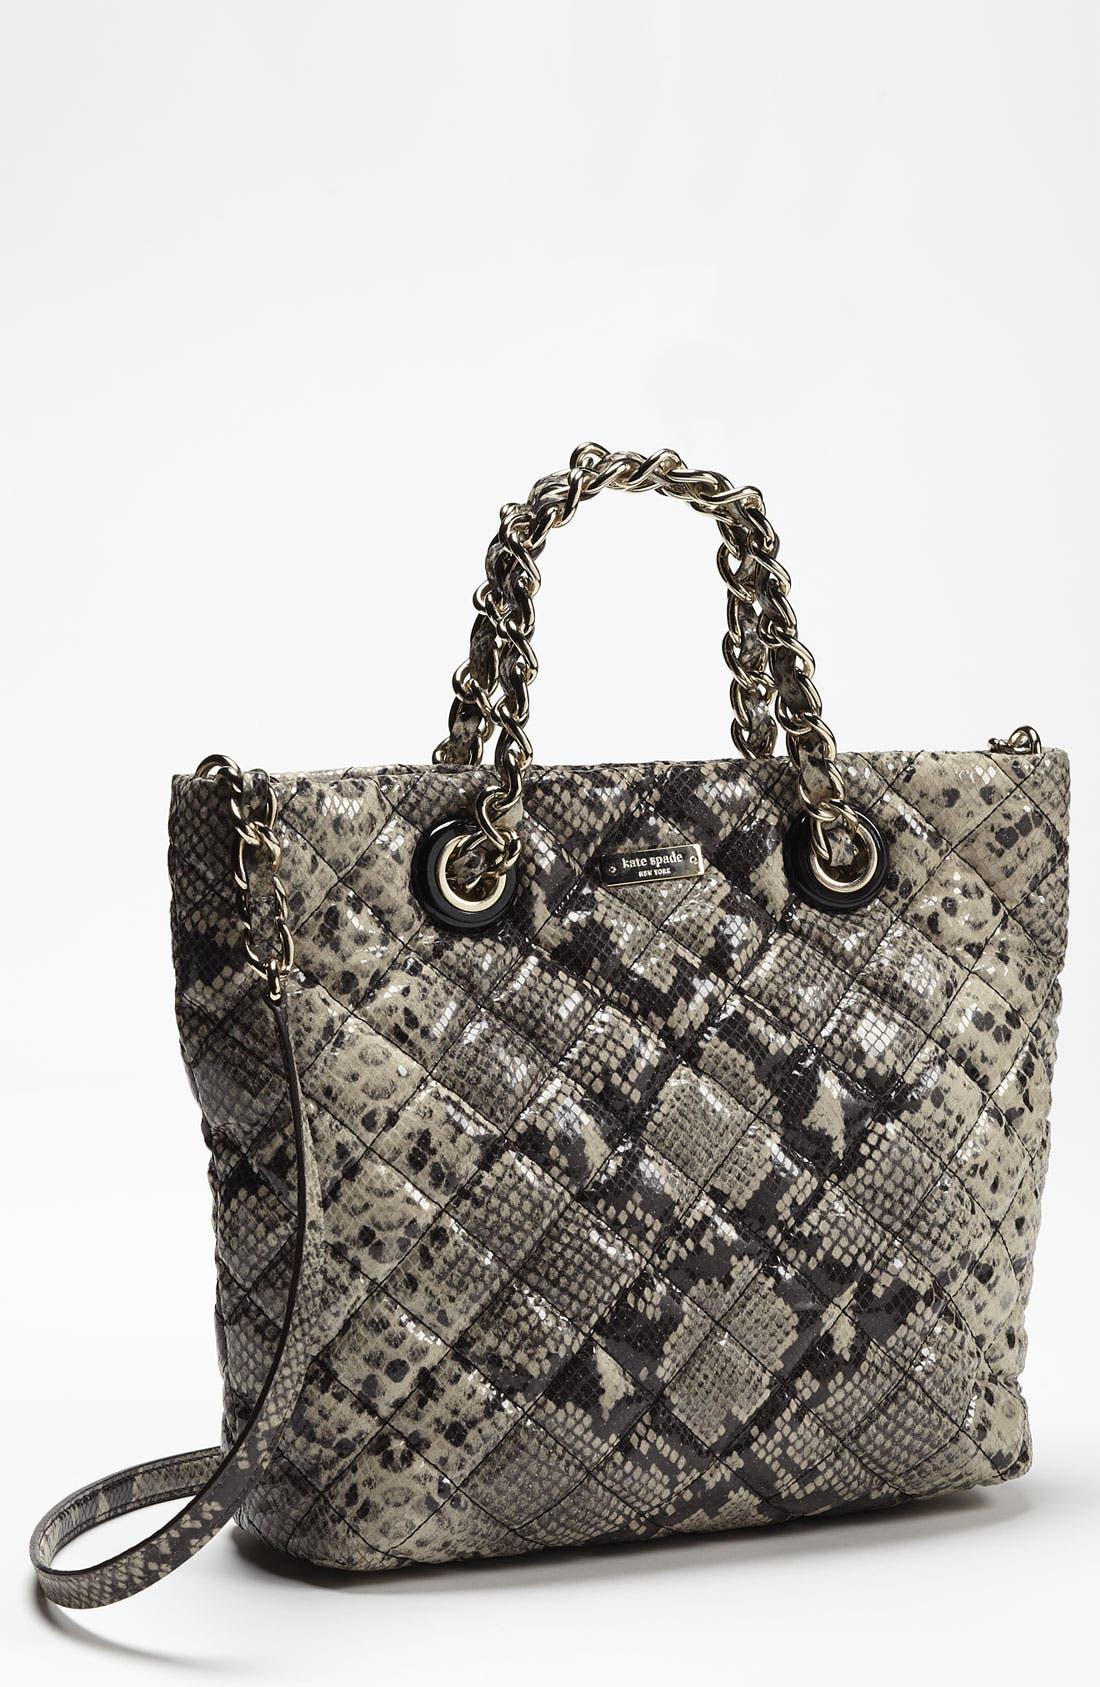 Alternate Image 1 Selected - kate spade new york 'gold coast - lilou' satchel